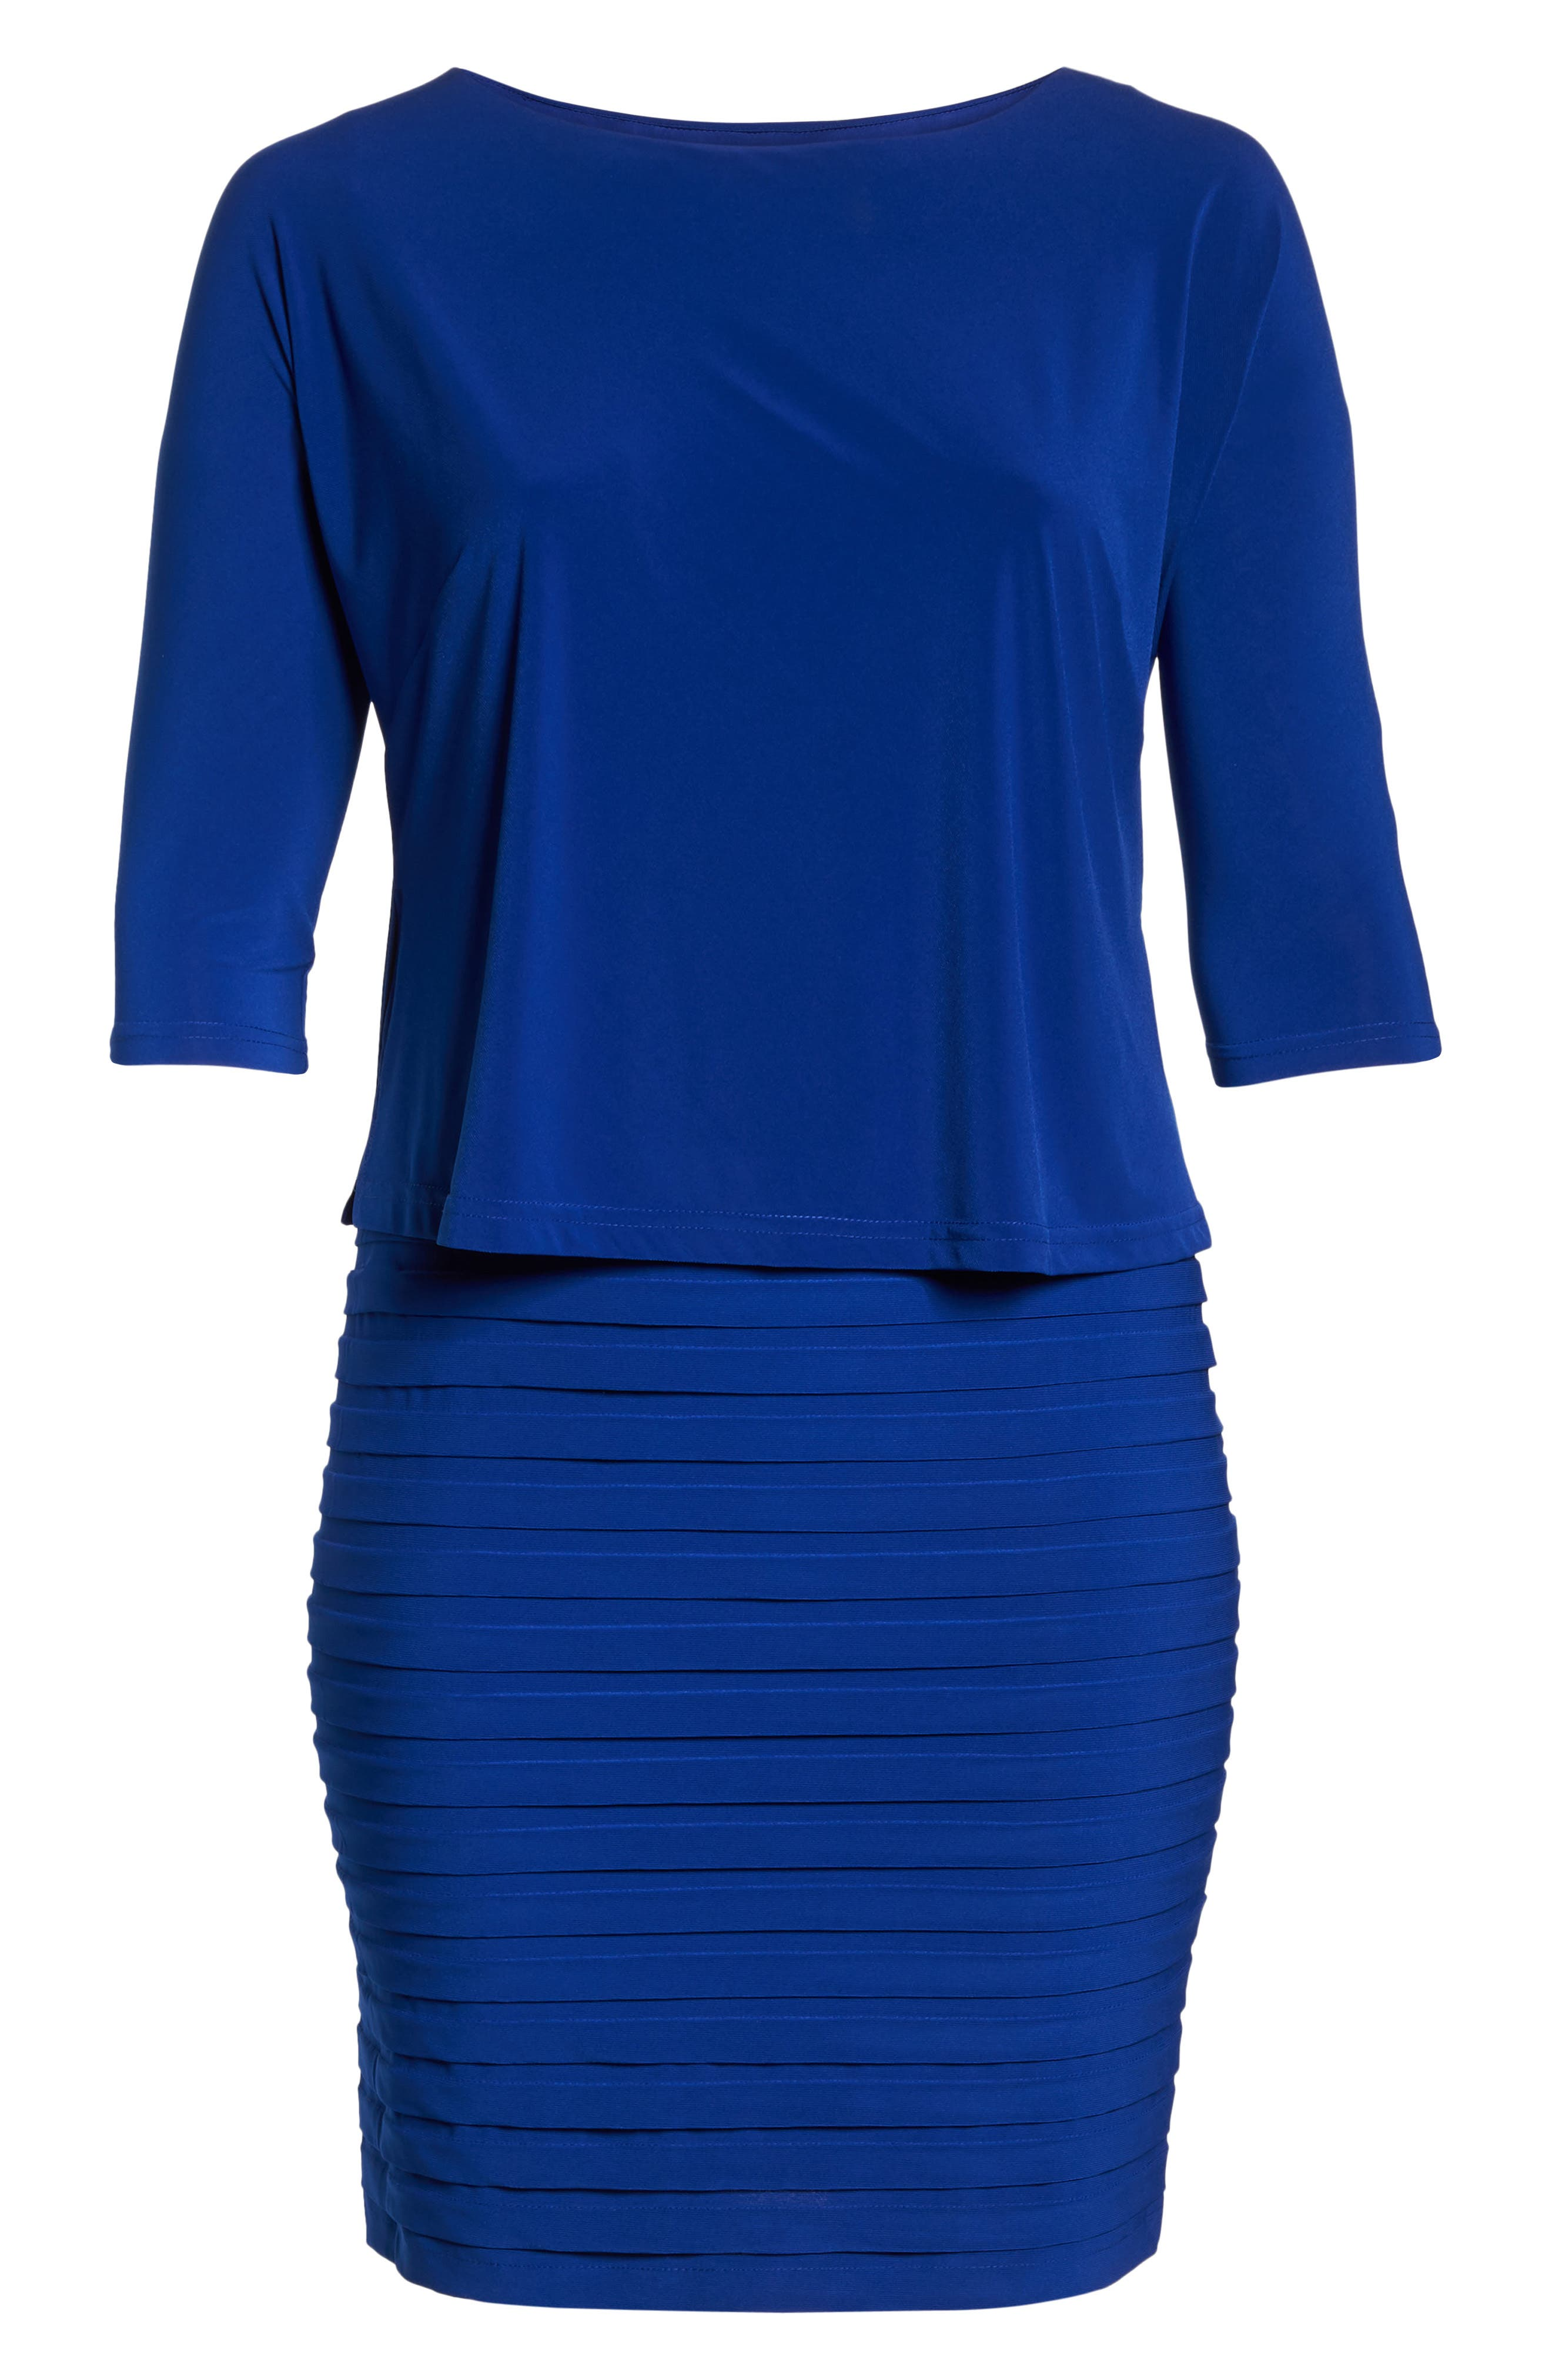 Shutter Pleat Popover Sheath Dress,                             Alternate thumbnail 7, color,                             SAPPHIRE